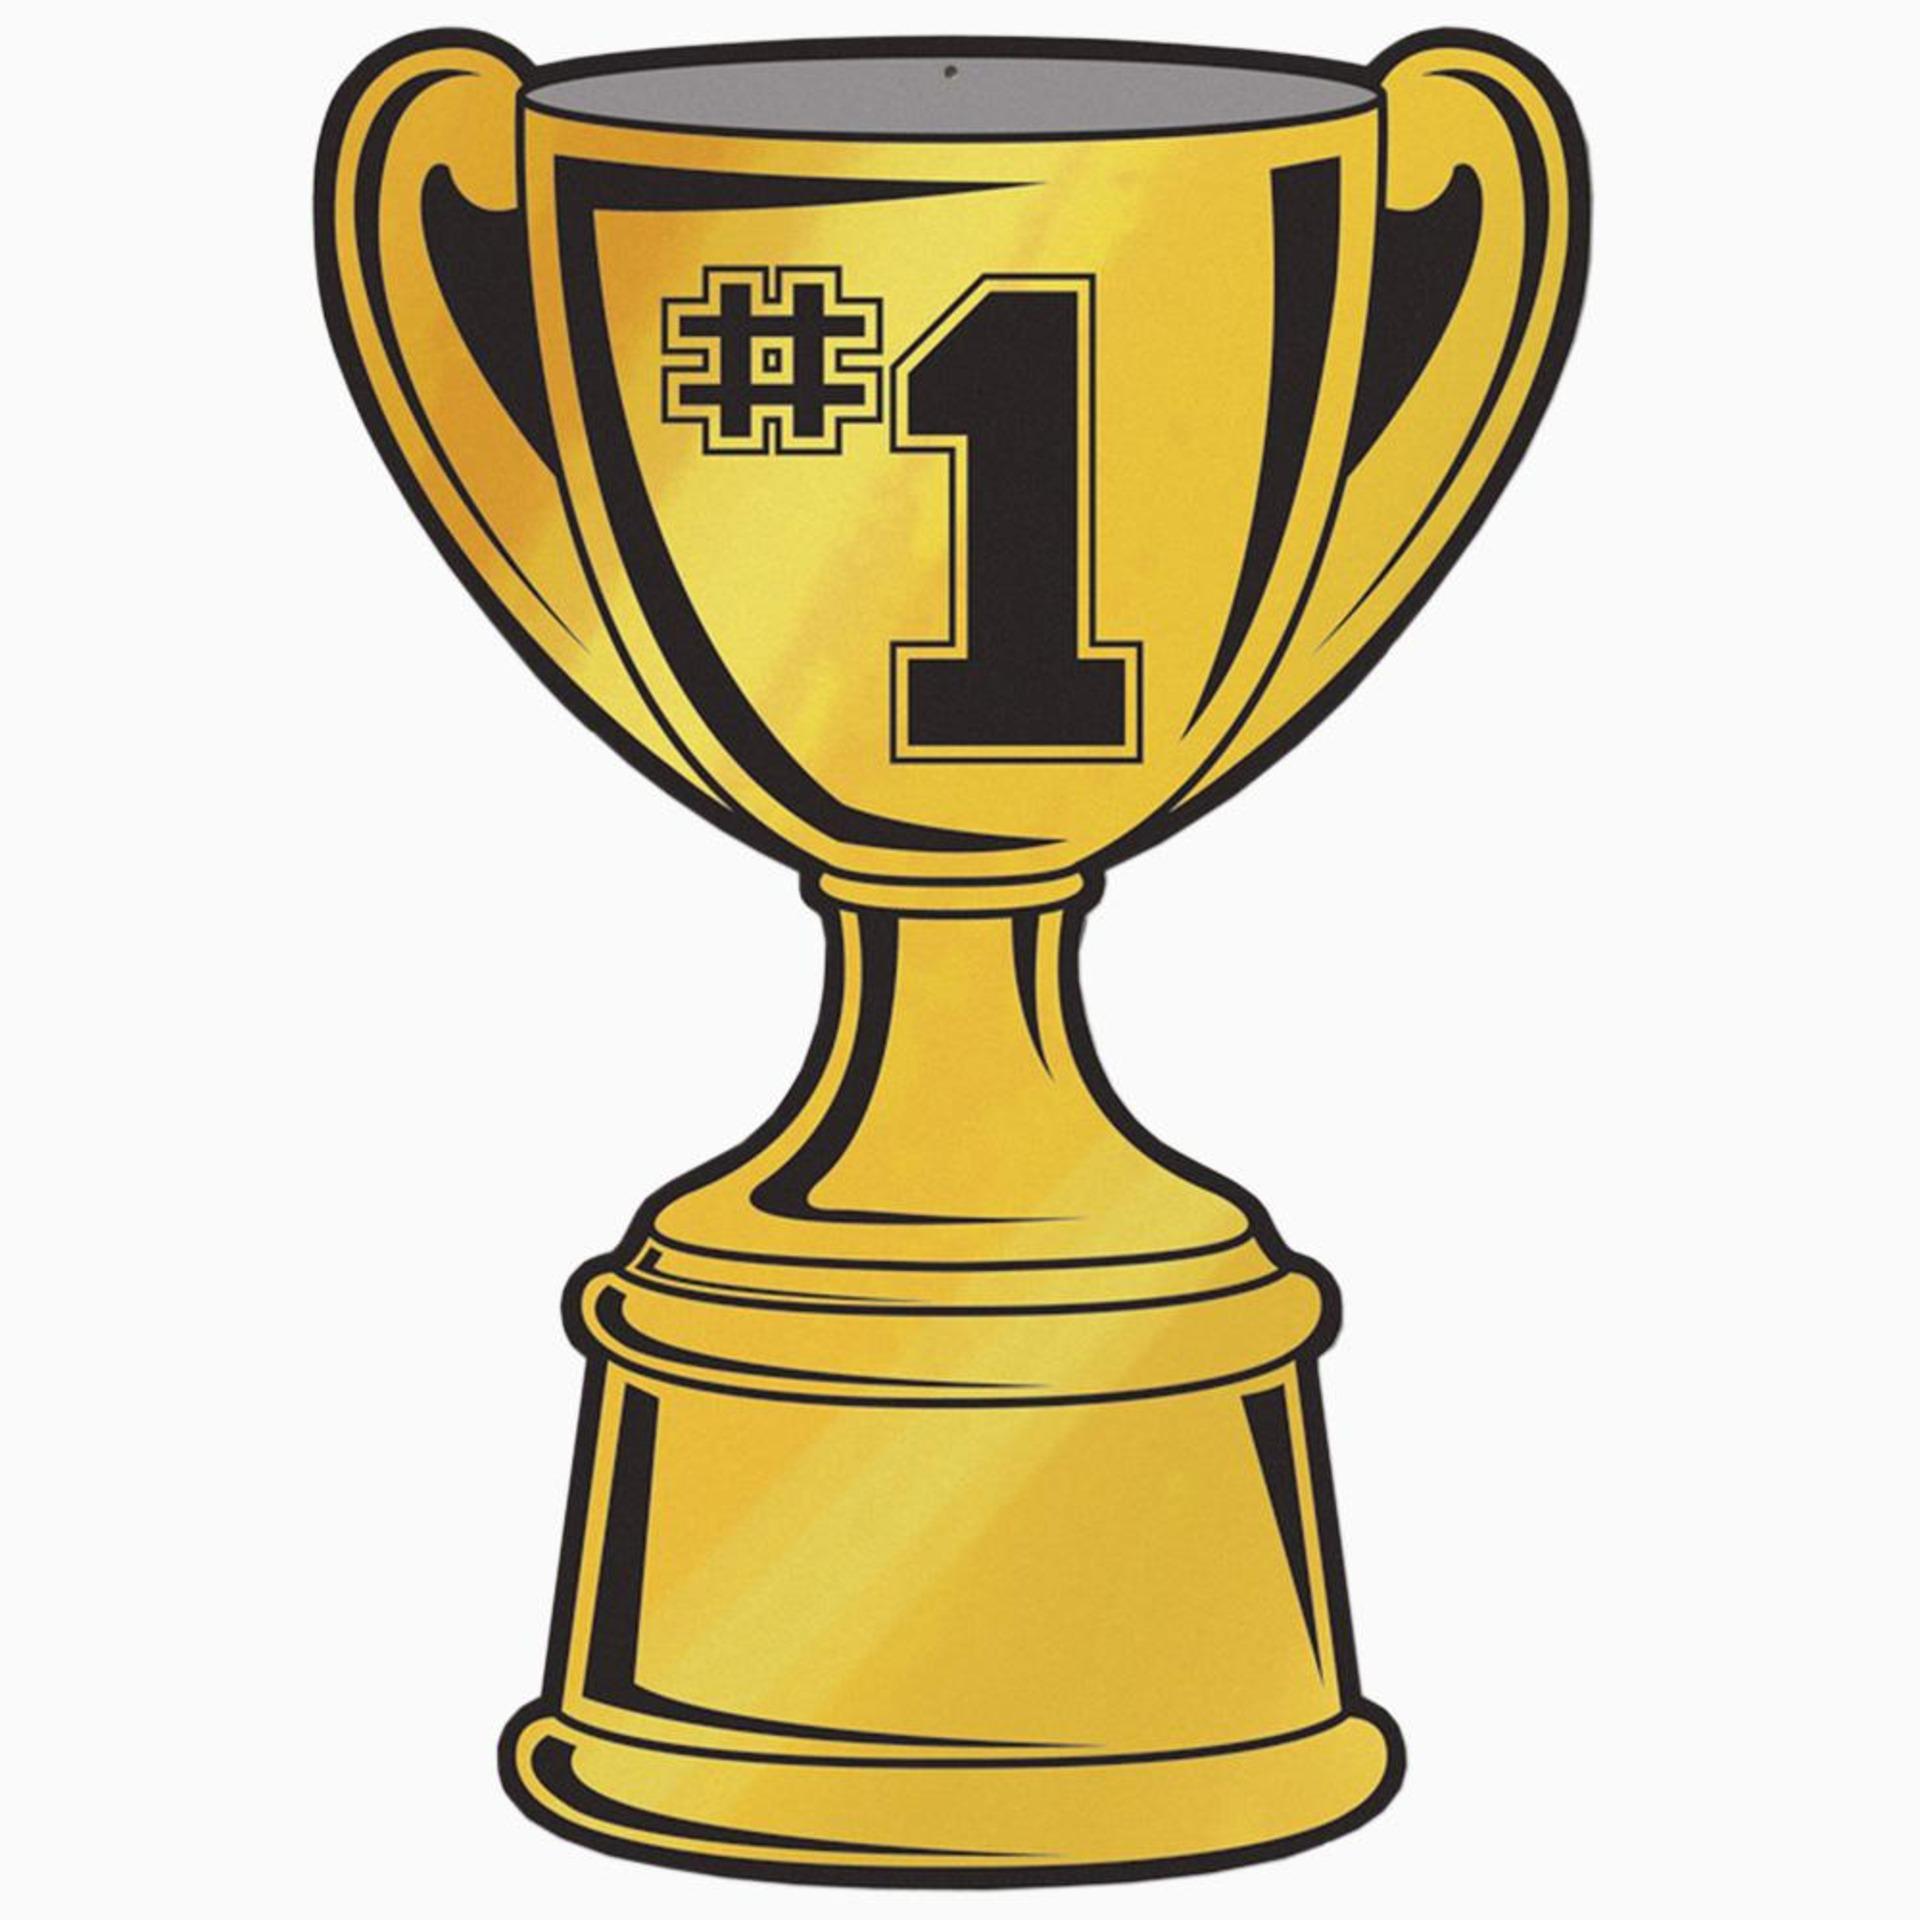 Clip art championship trophy.